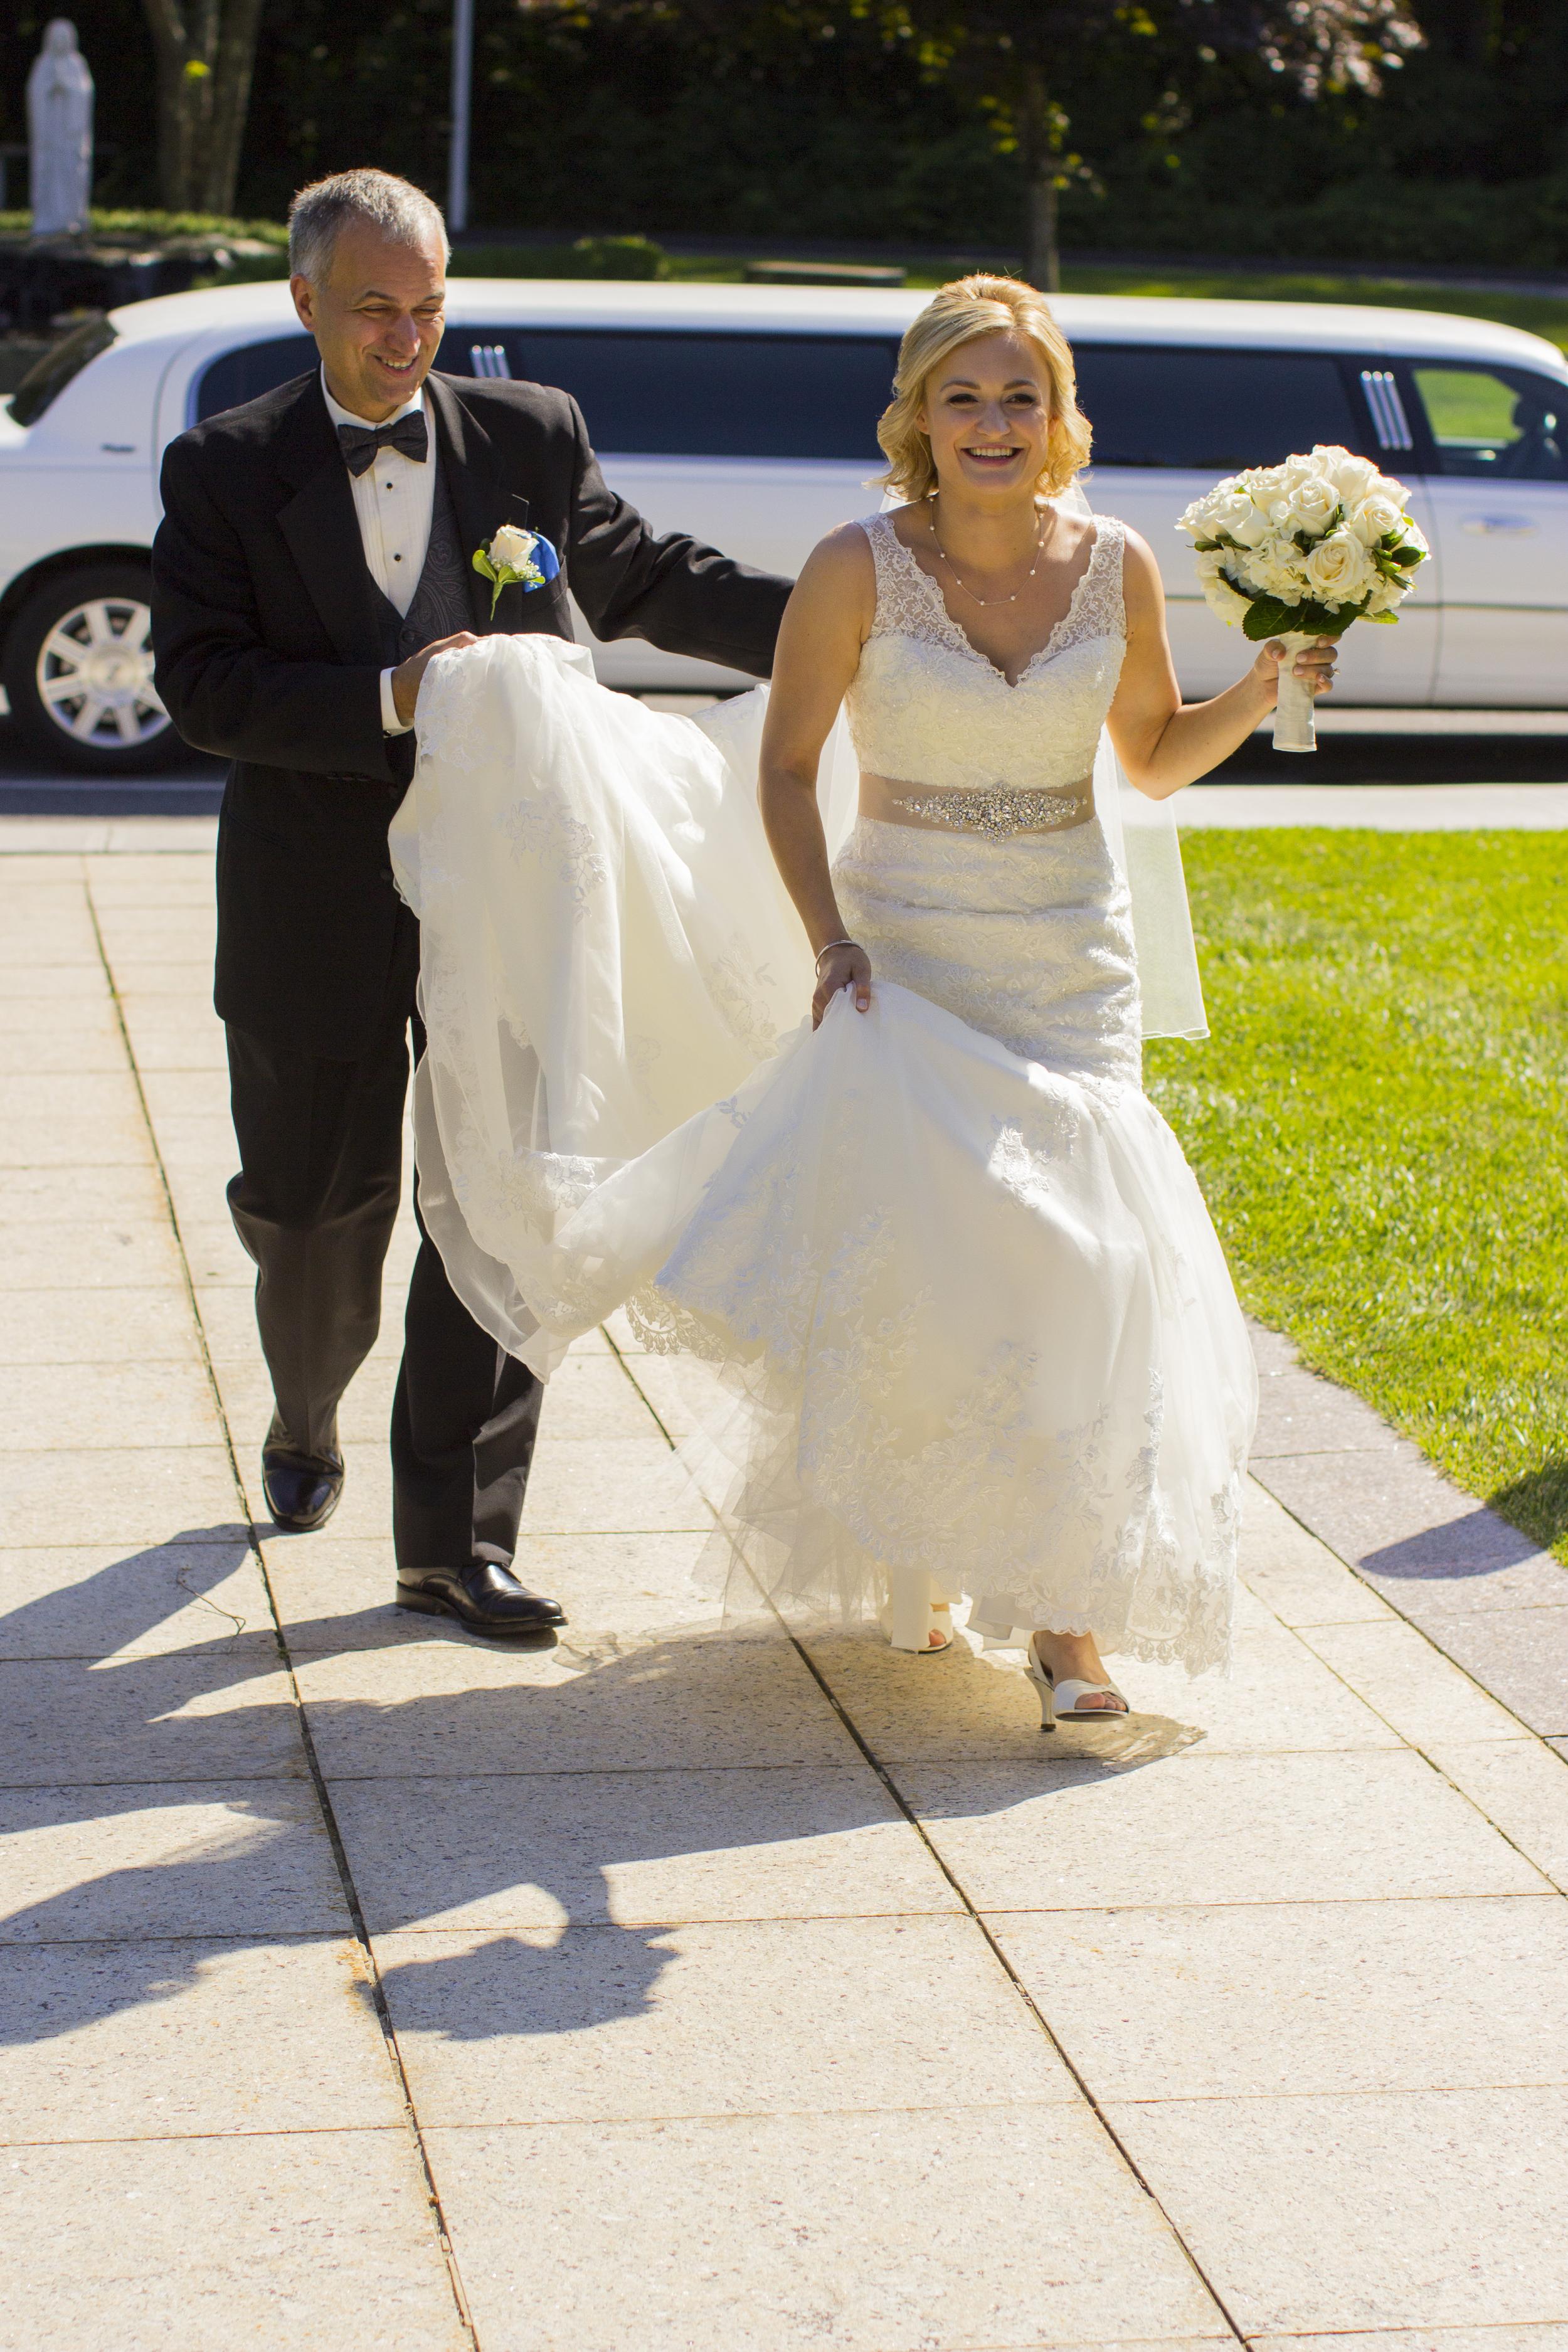 wedding july 11 3-1.JPG